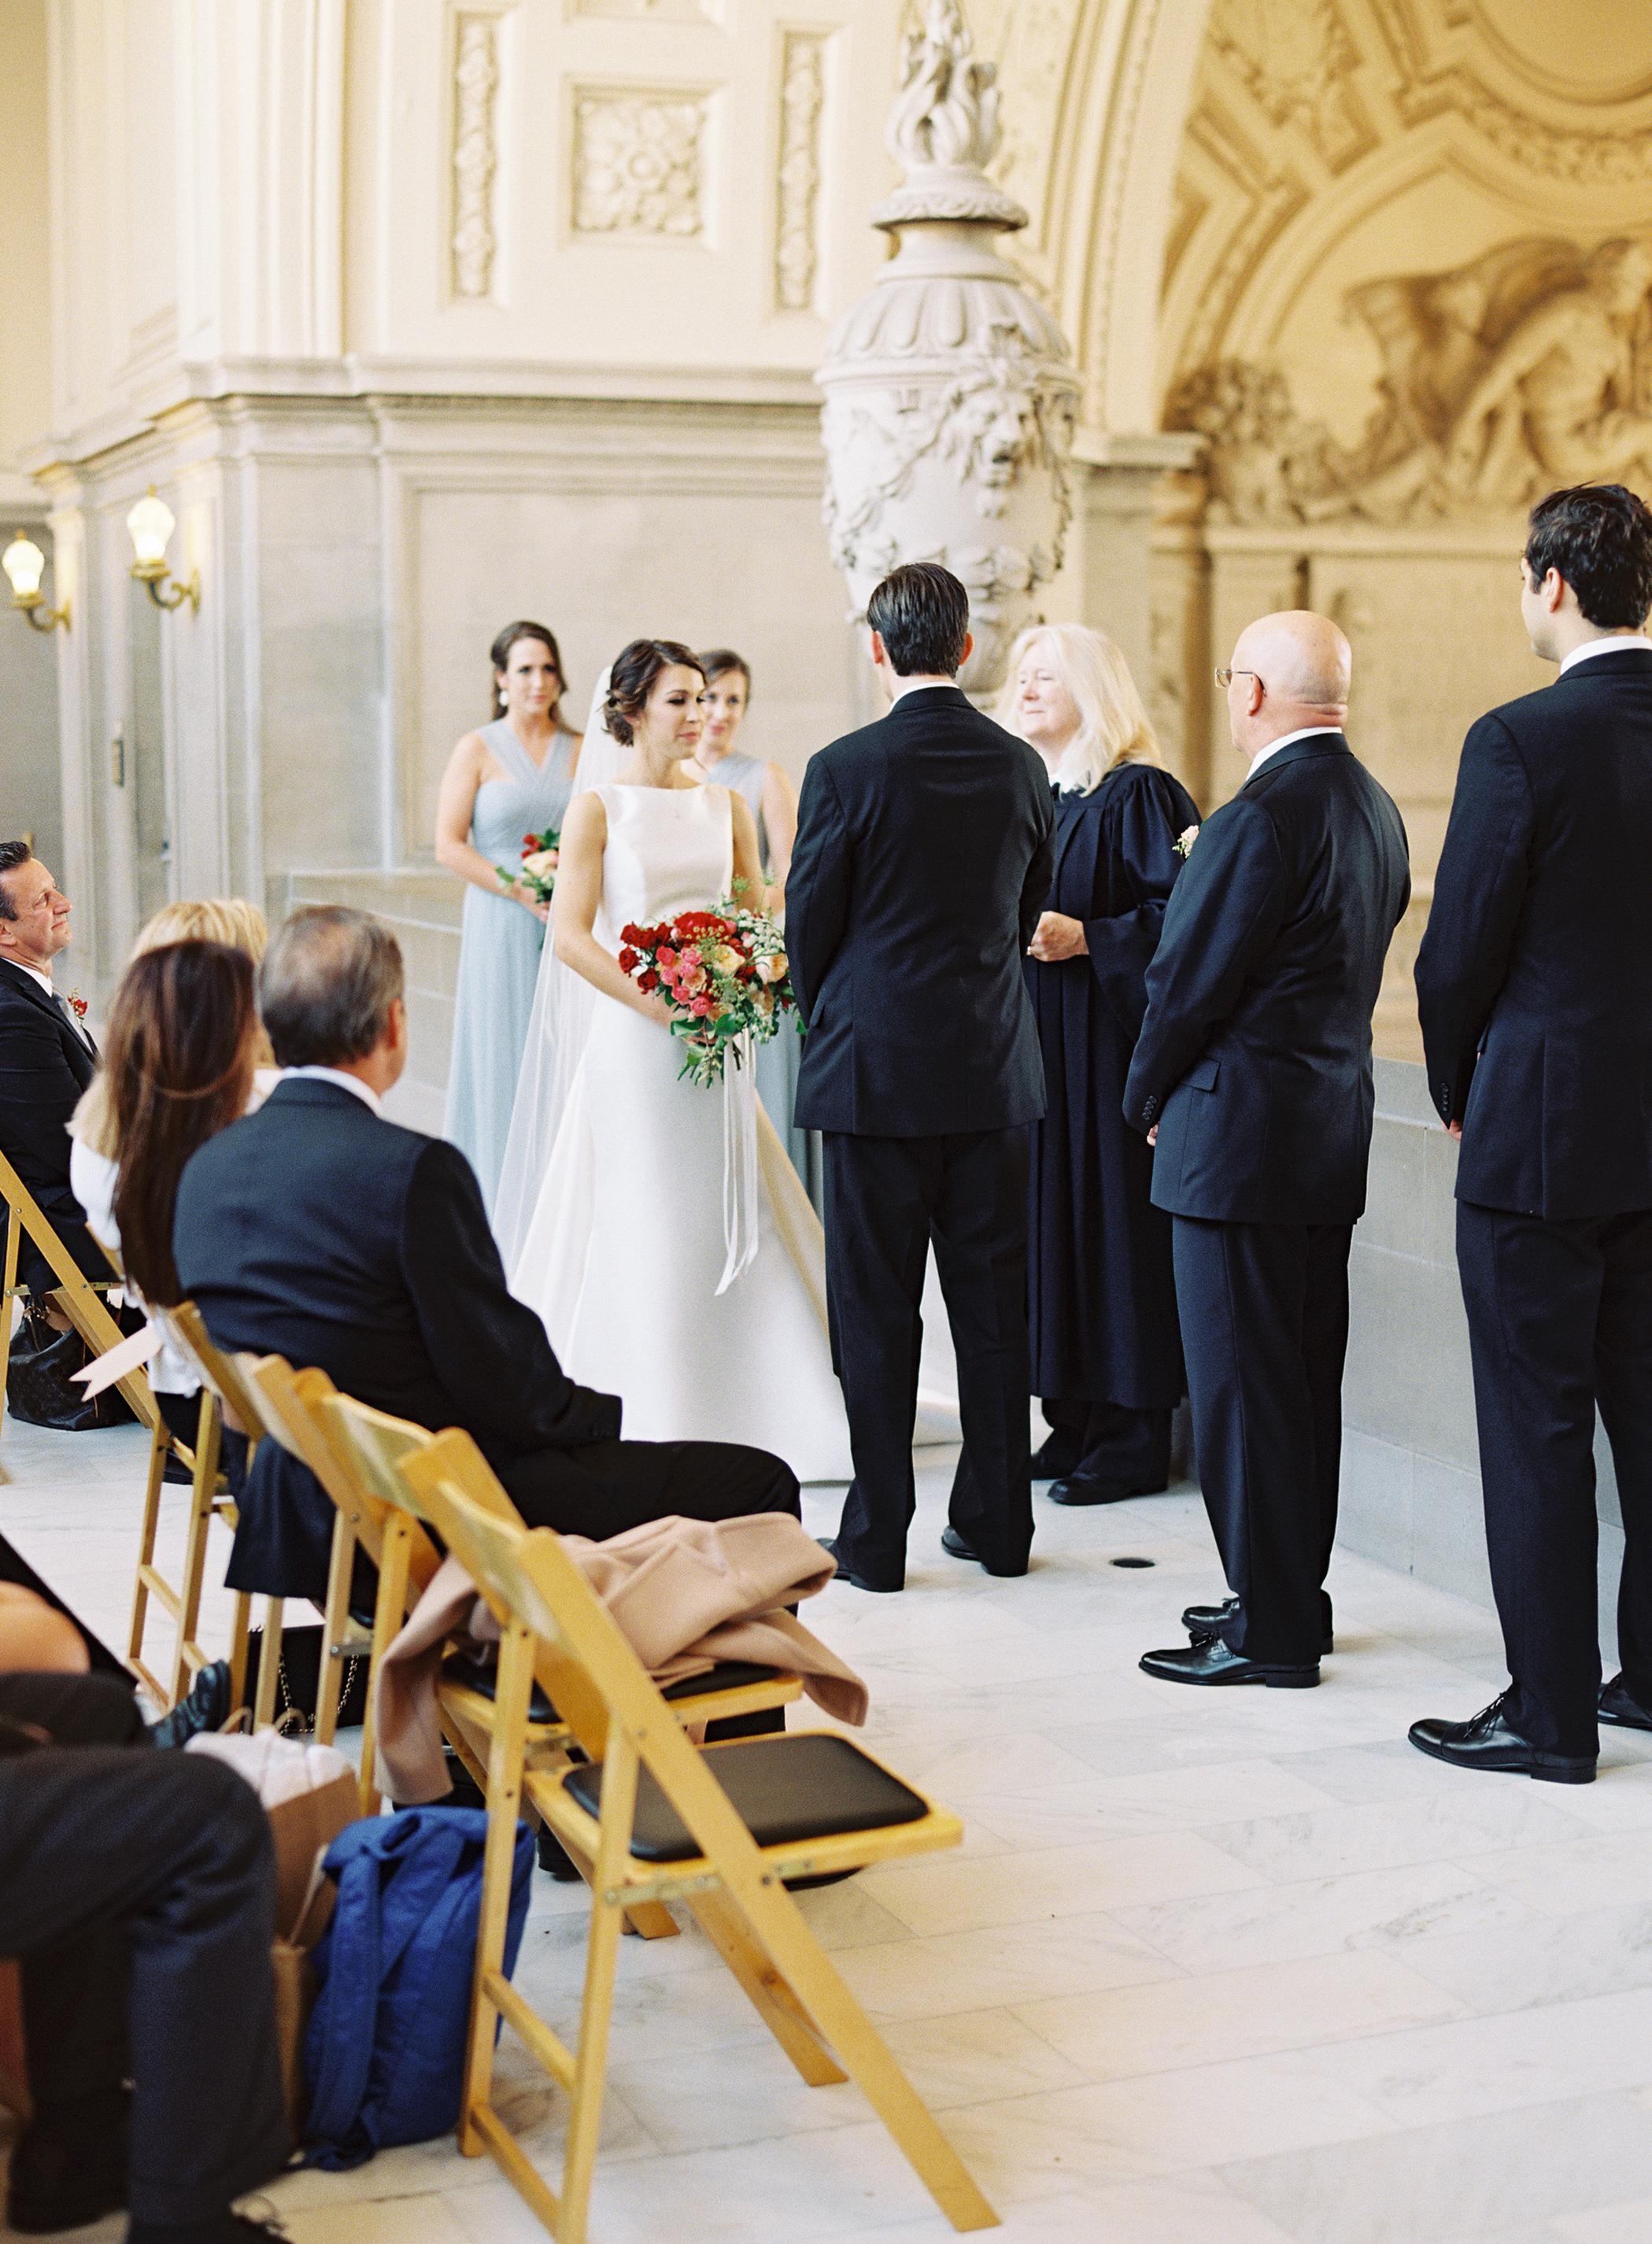 Meghan Mehan Photography - California Wedding Photographer | San Francisco City Hall Wedding 092.jpg